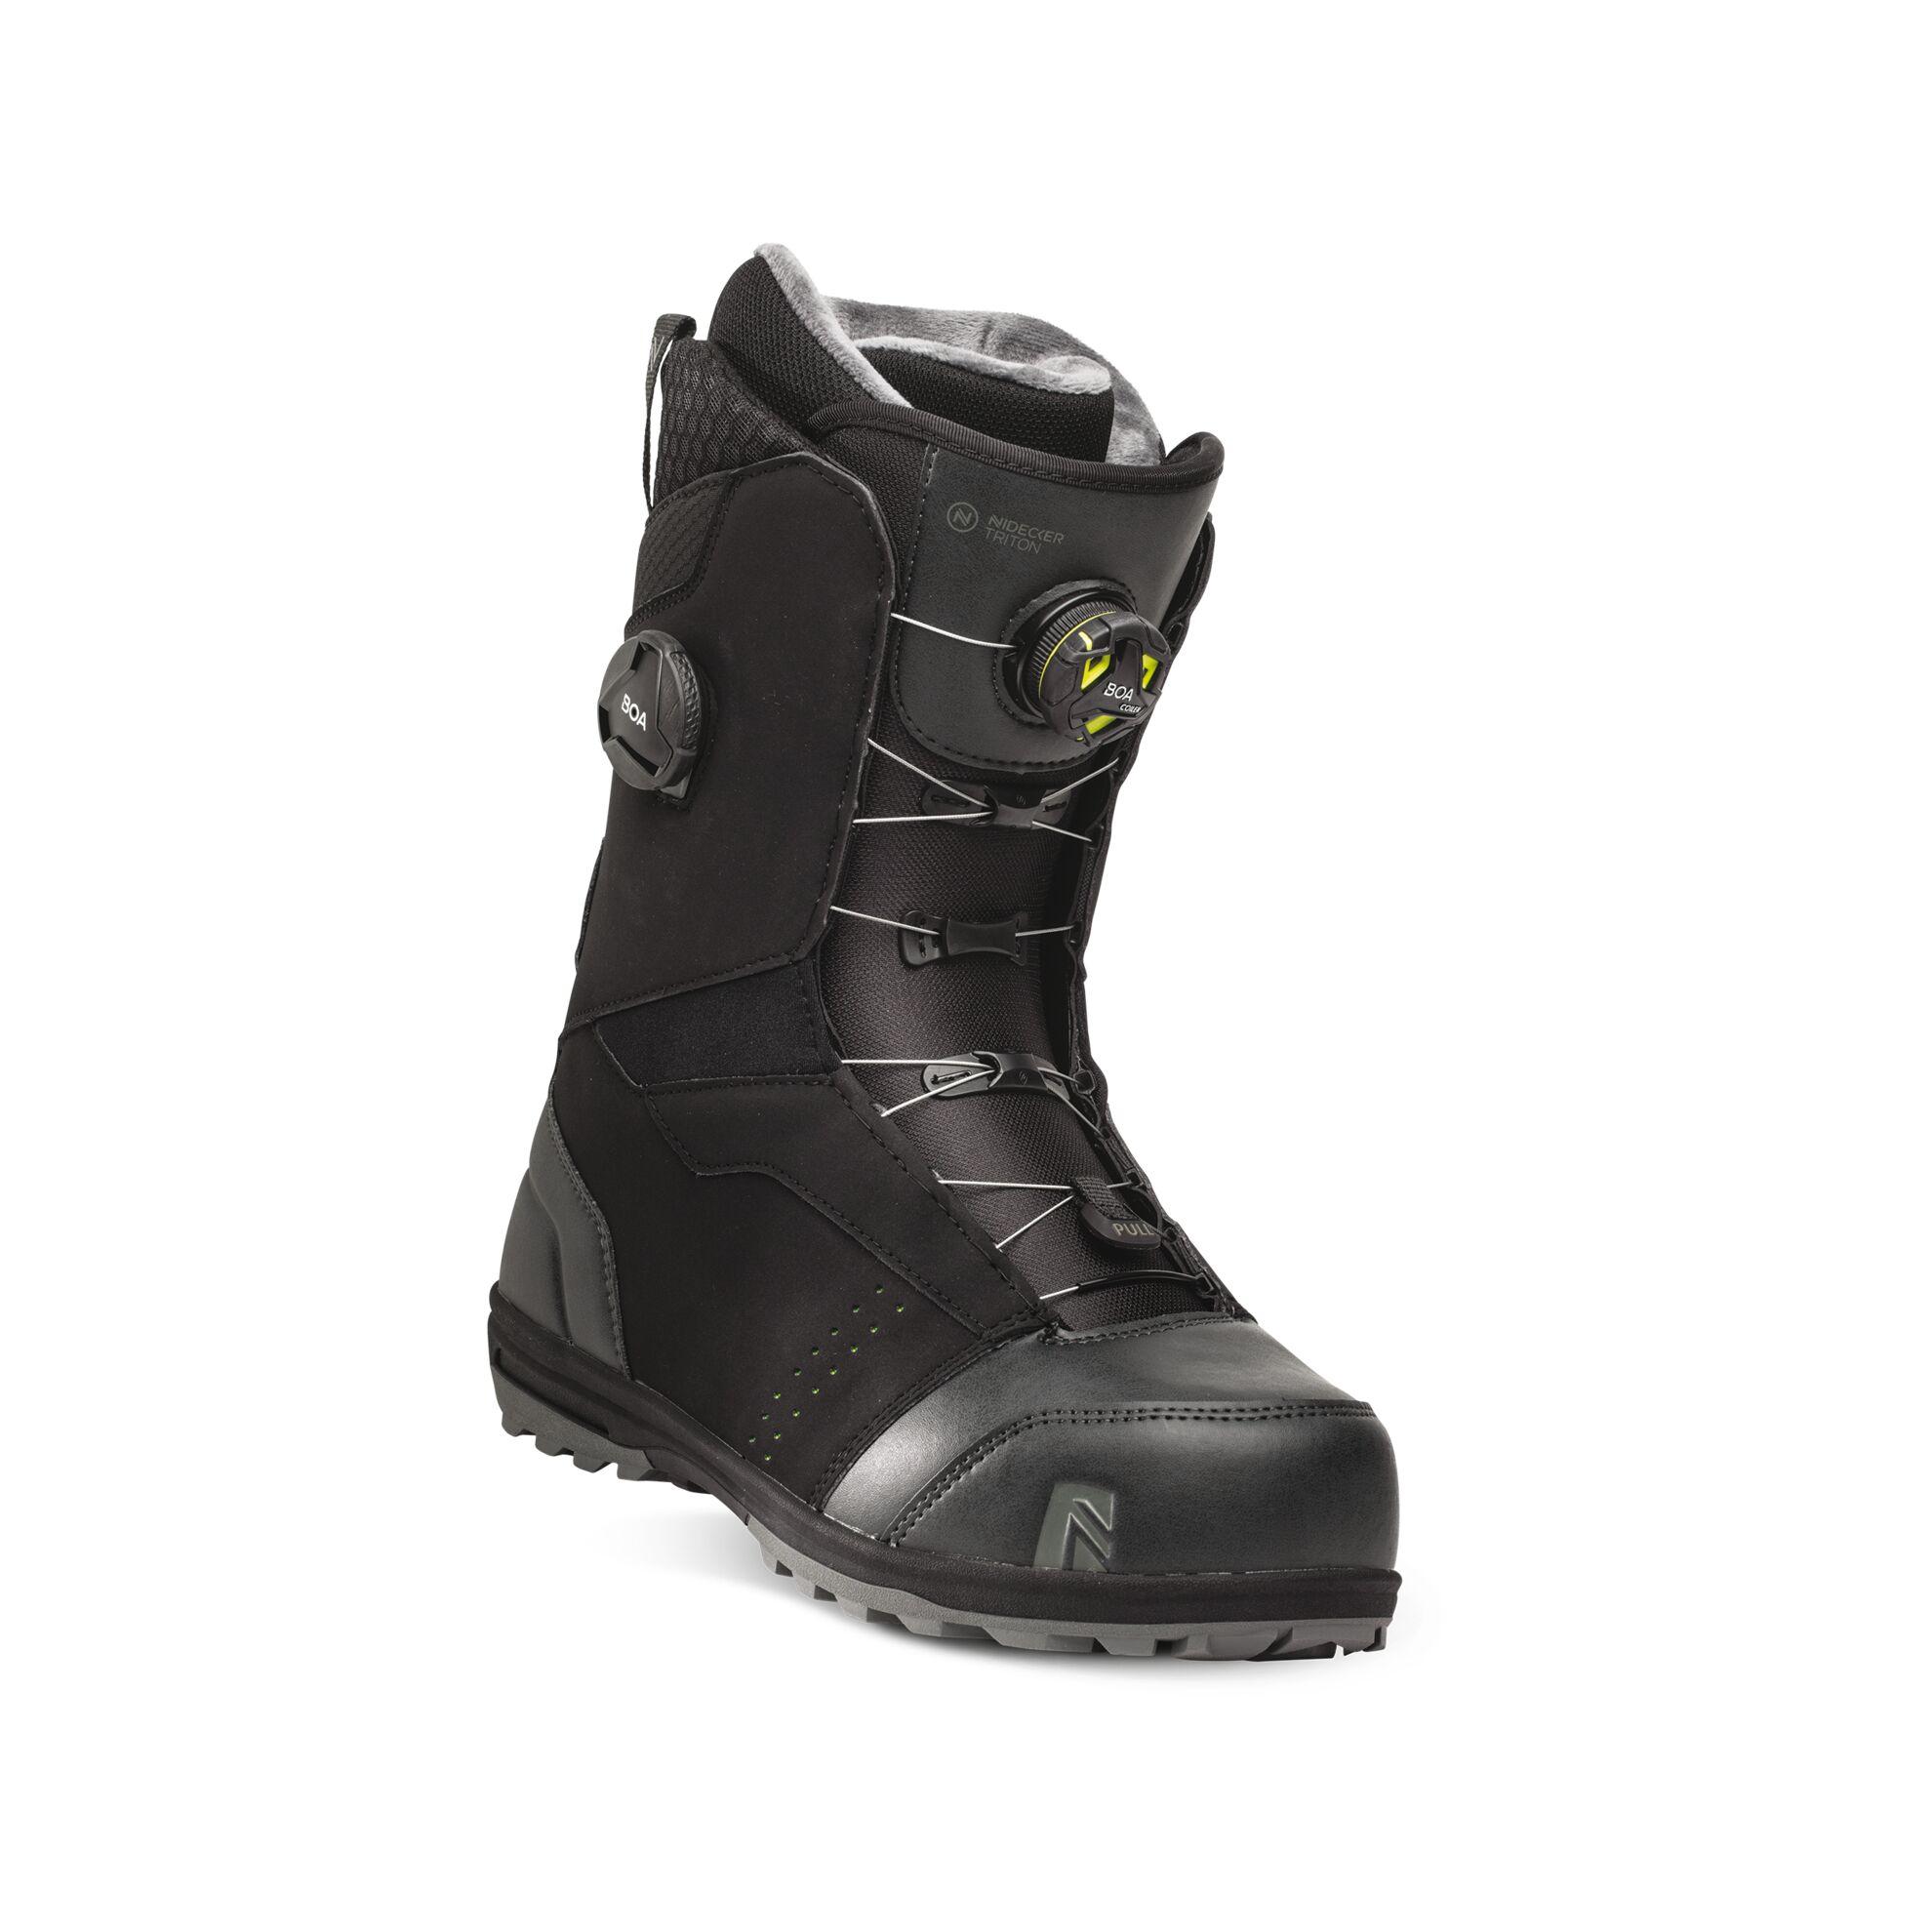 Boots snowboard Barbati Nidecker Triton Boa Focus Negru 20/21 imagine